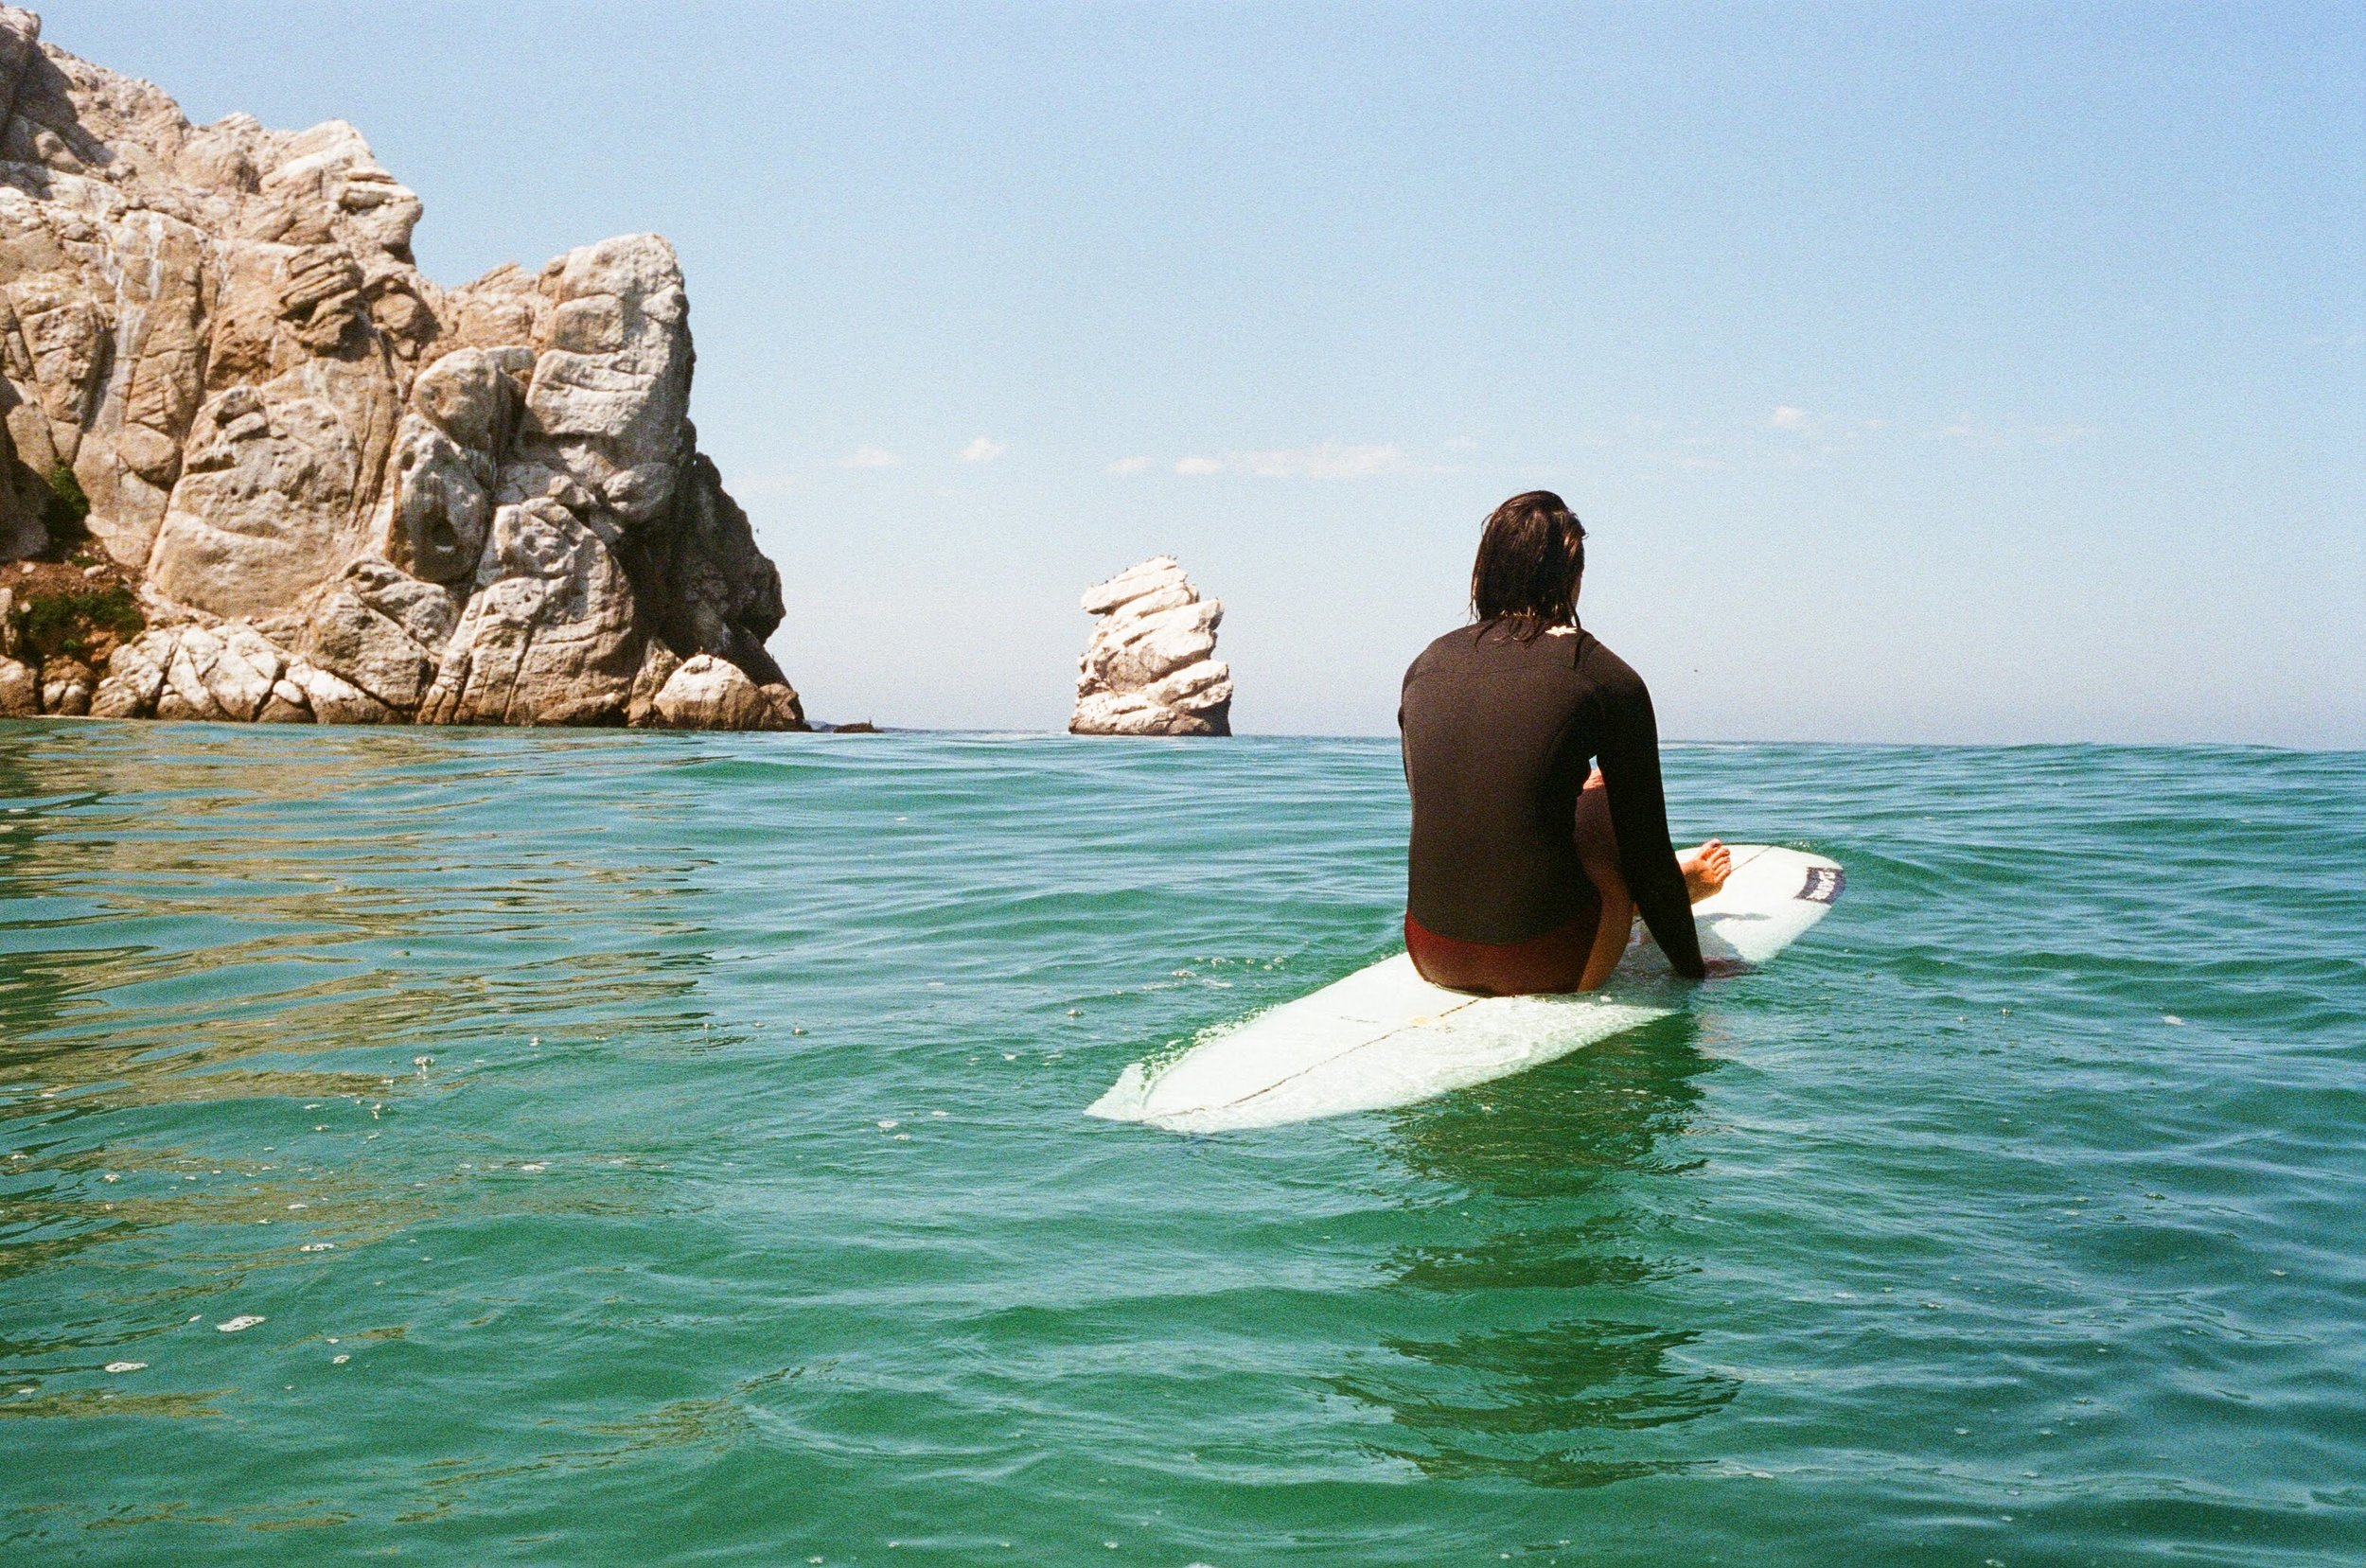 Sierra Lerback waiting for a set. (Morro Bay, California)